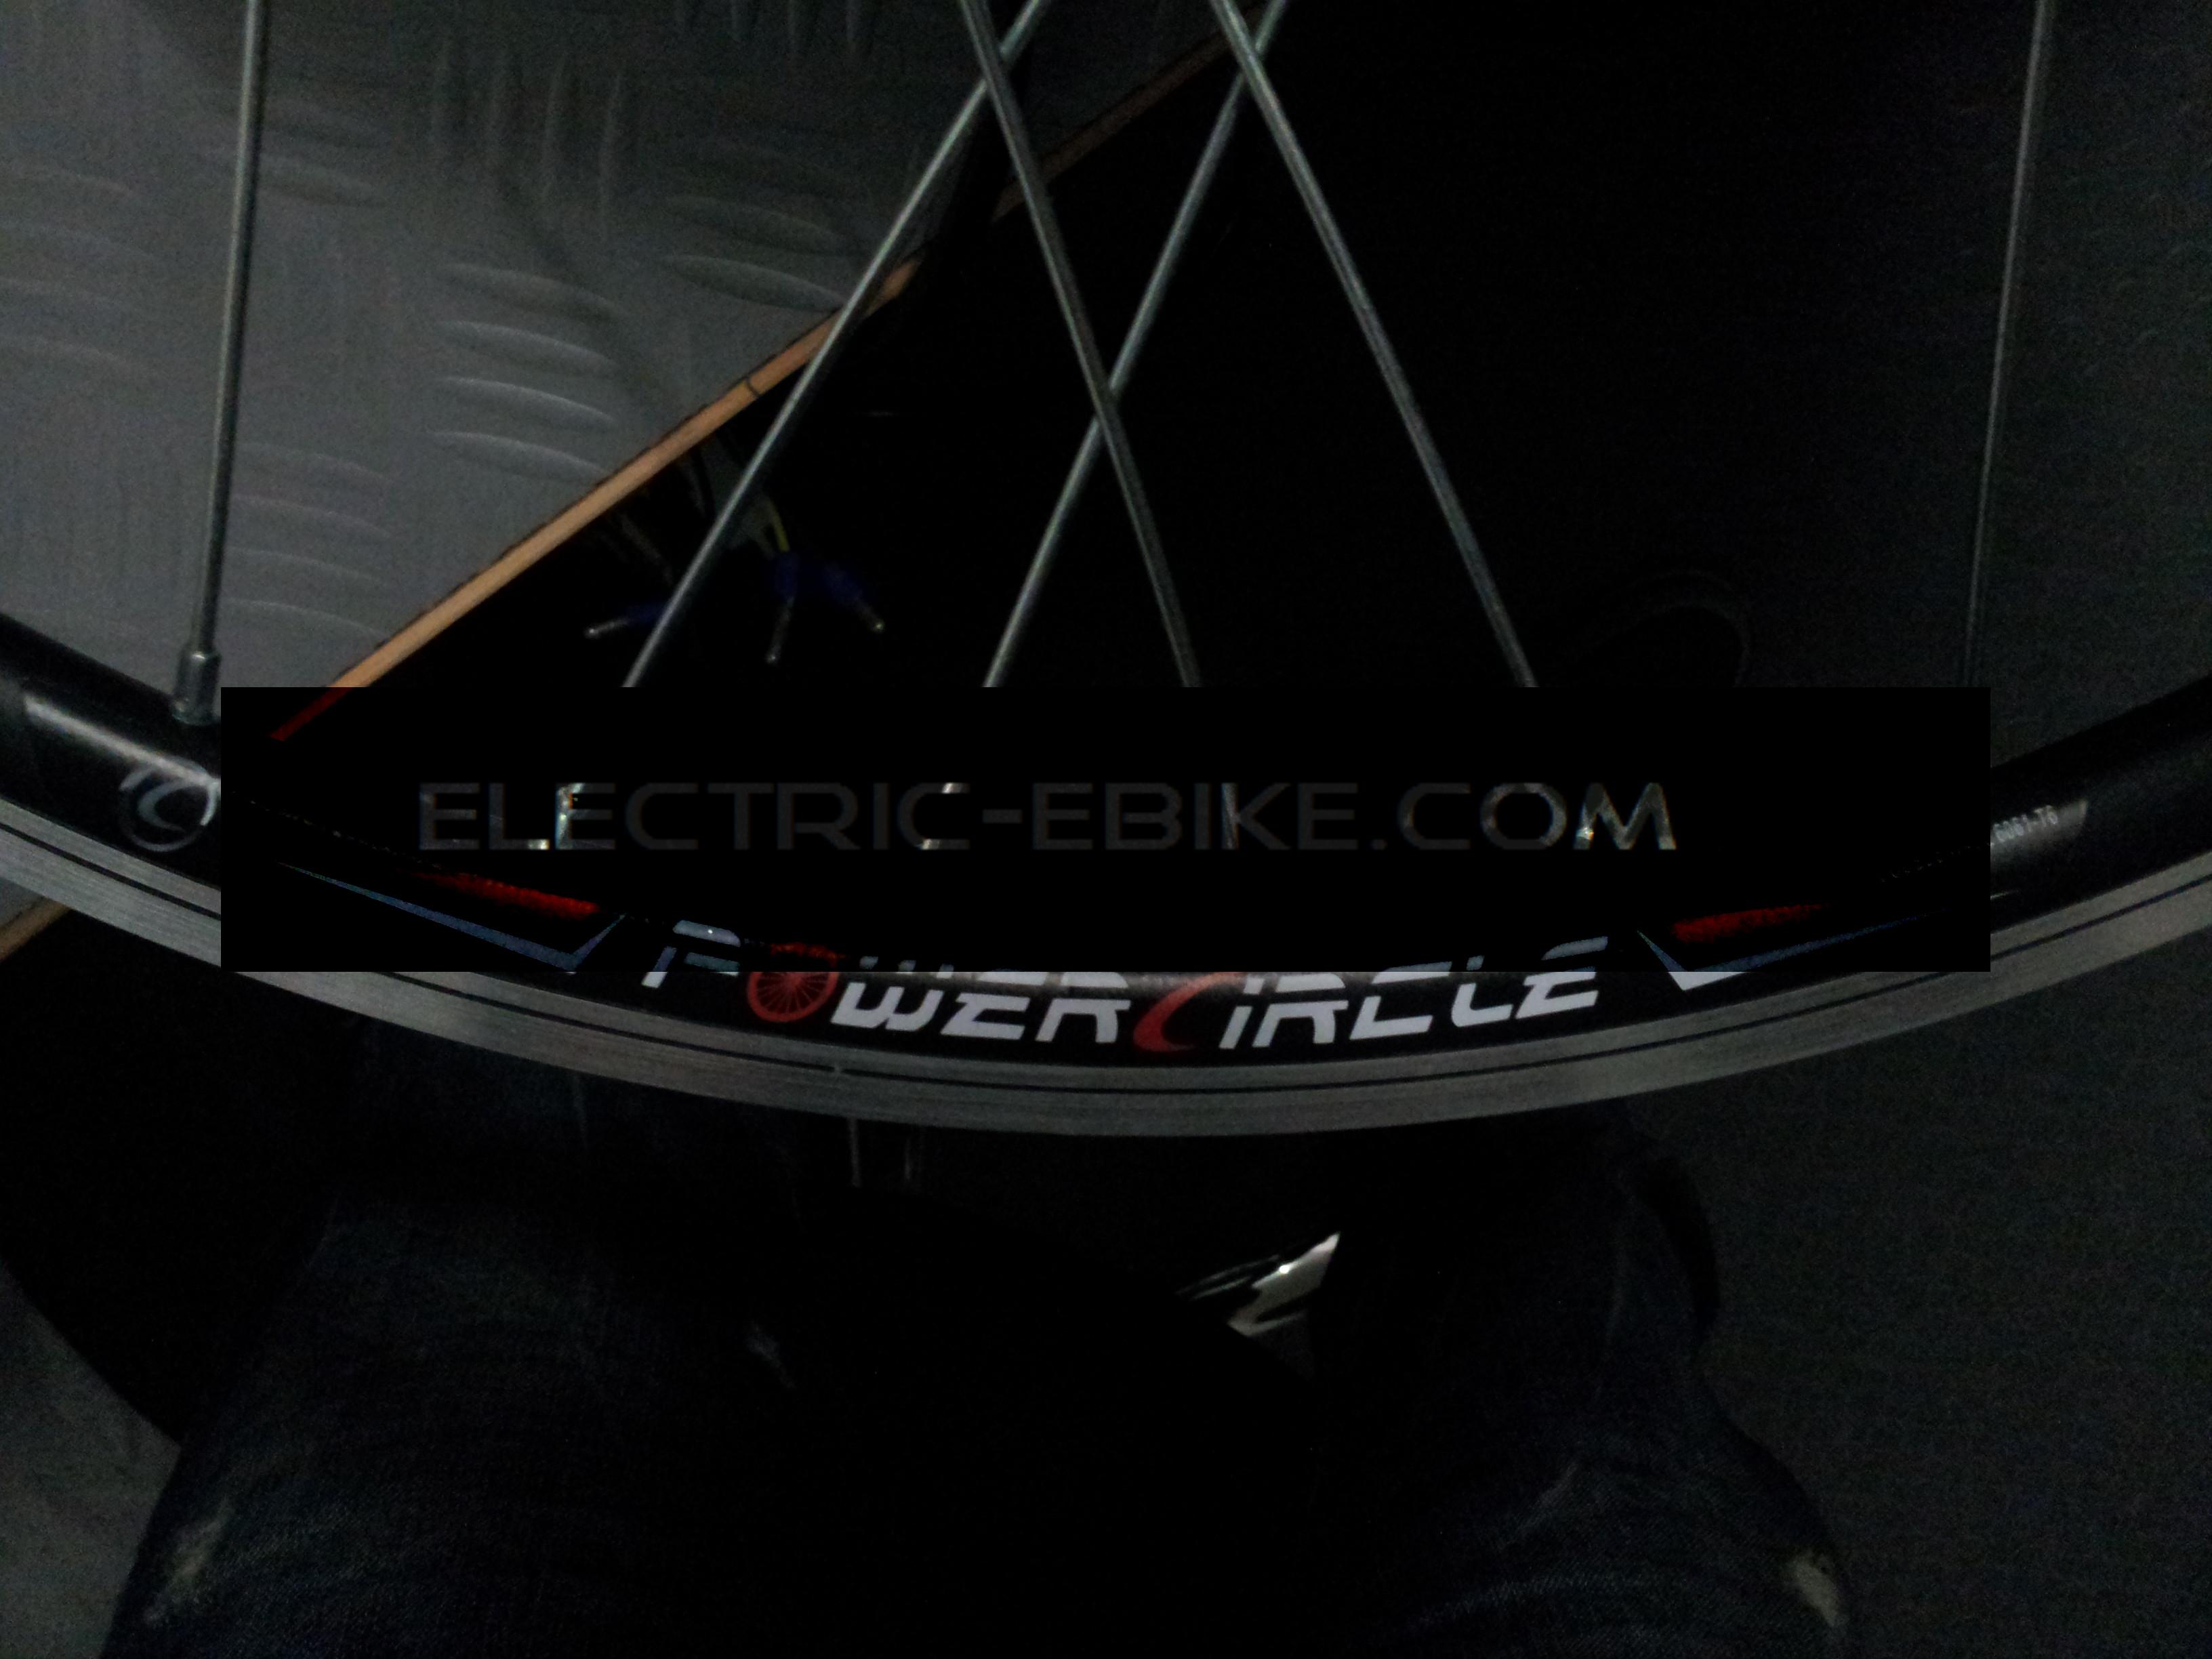 Schema Elettrico Ebike : Rear conversion kit for w electric bike u electric ebike